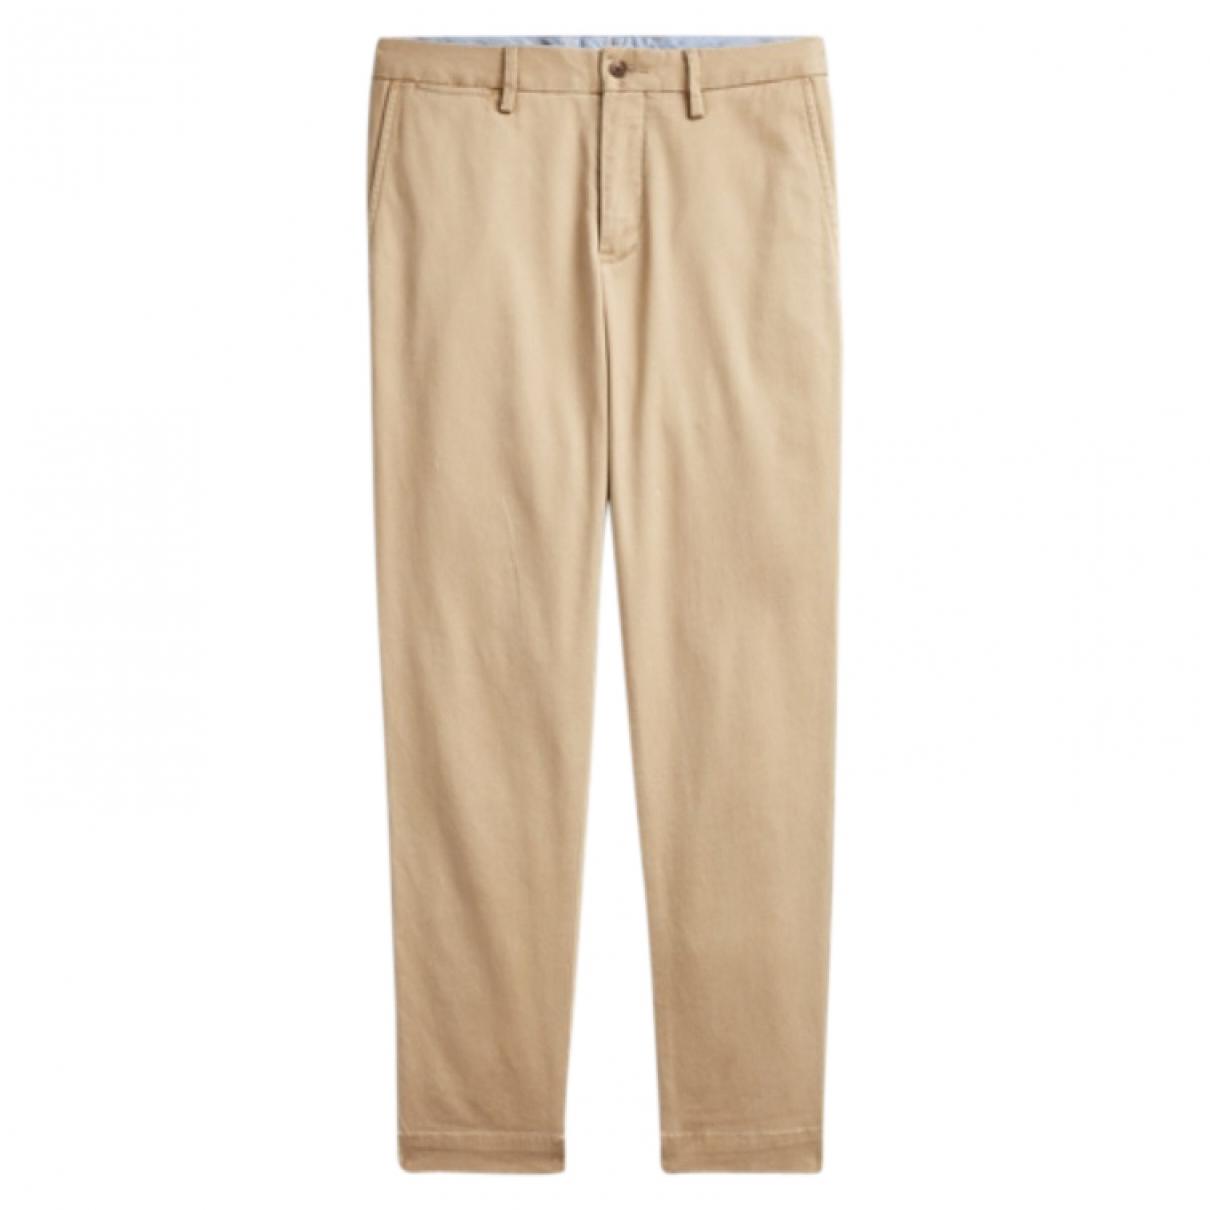 Polo Ralph Lauren \N Beige Cotton Trousers for Women 10 US